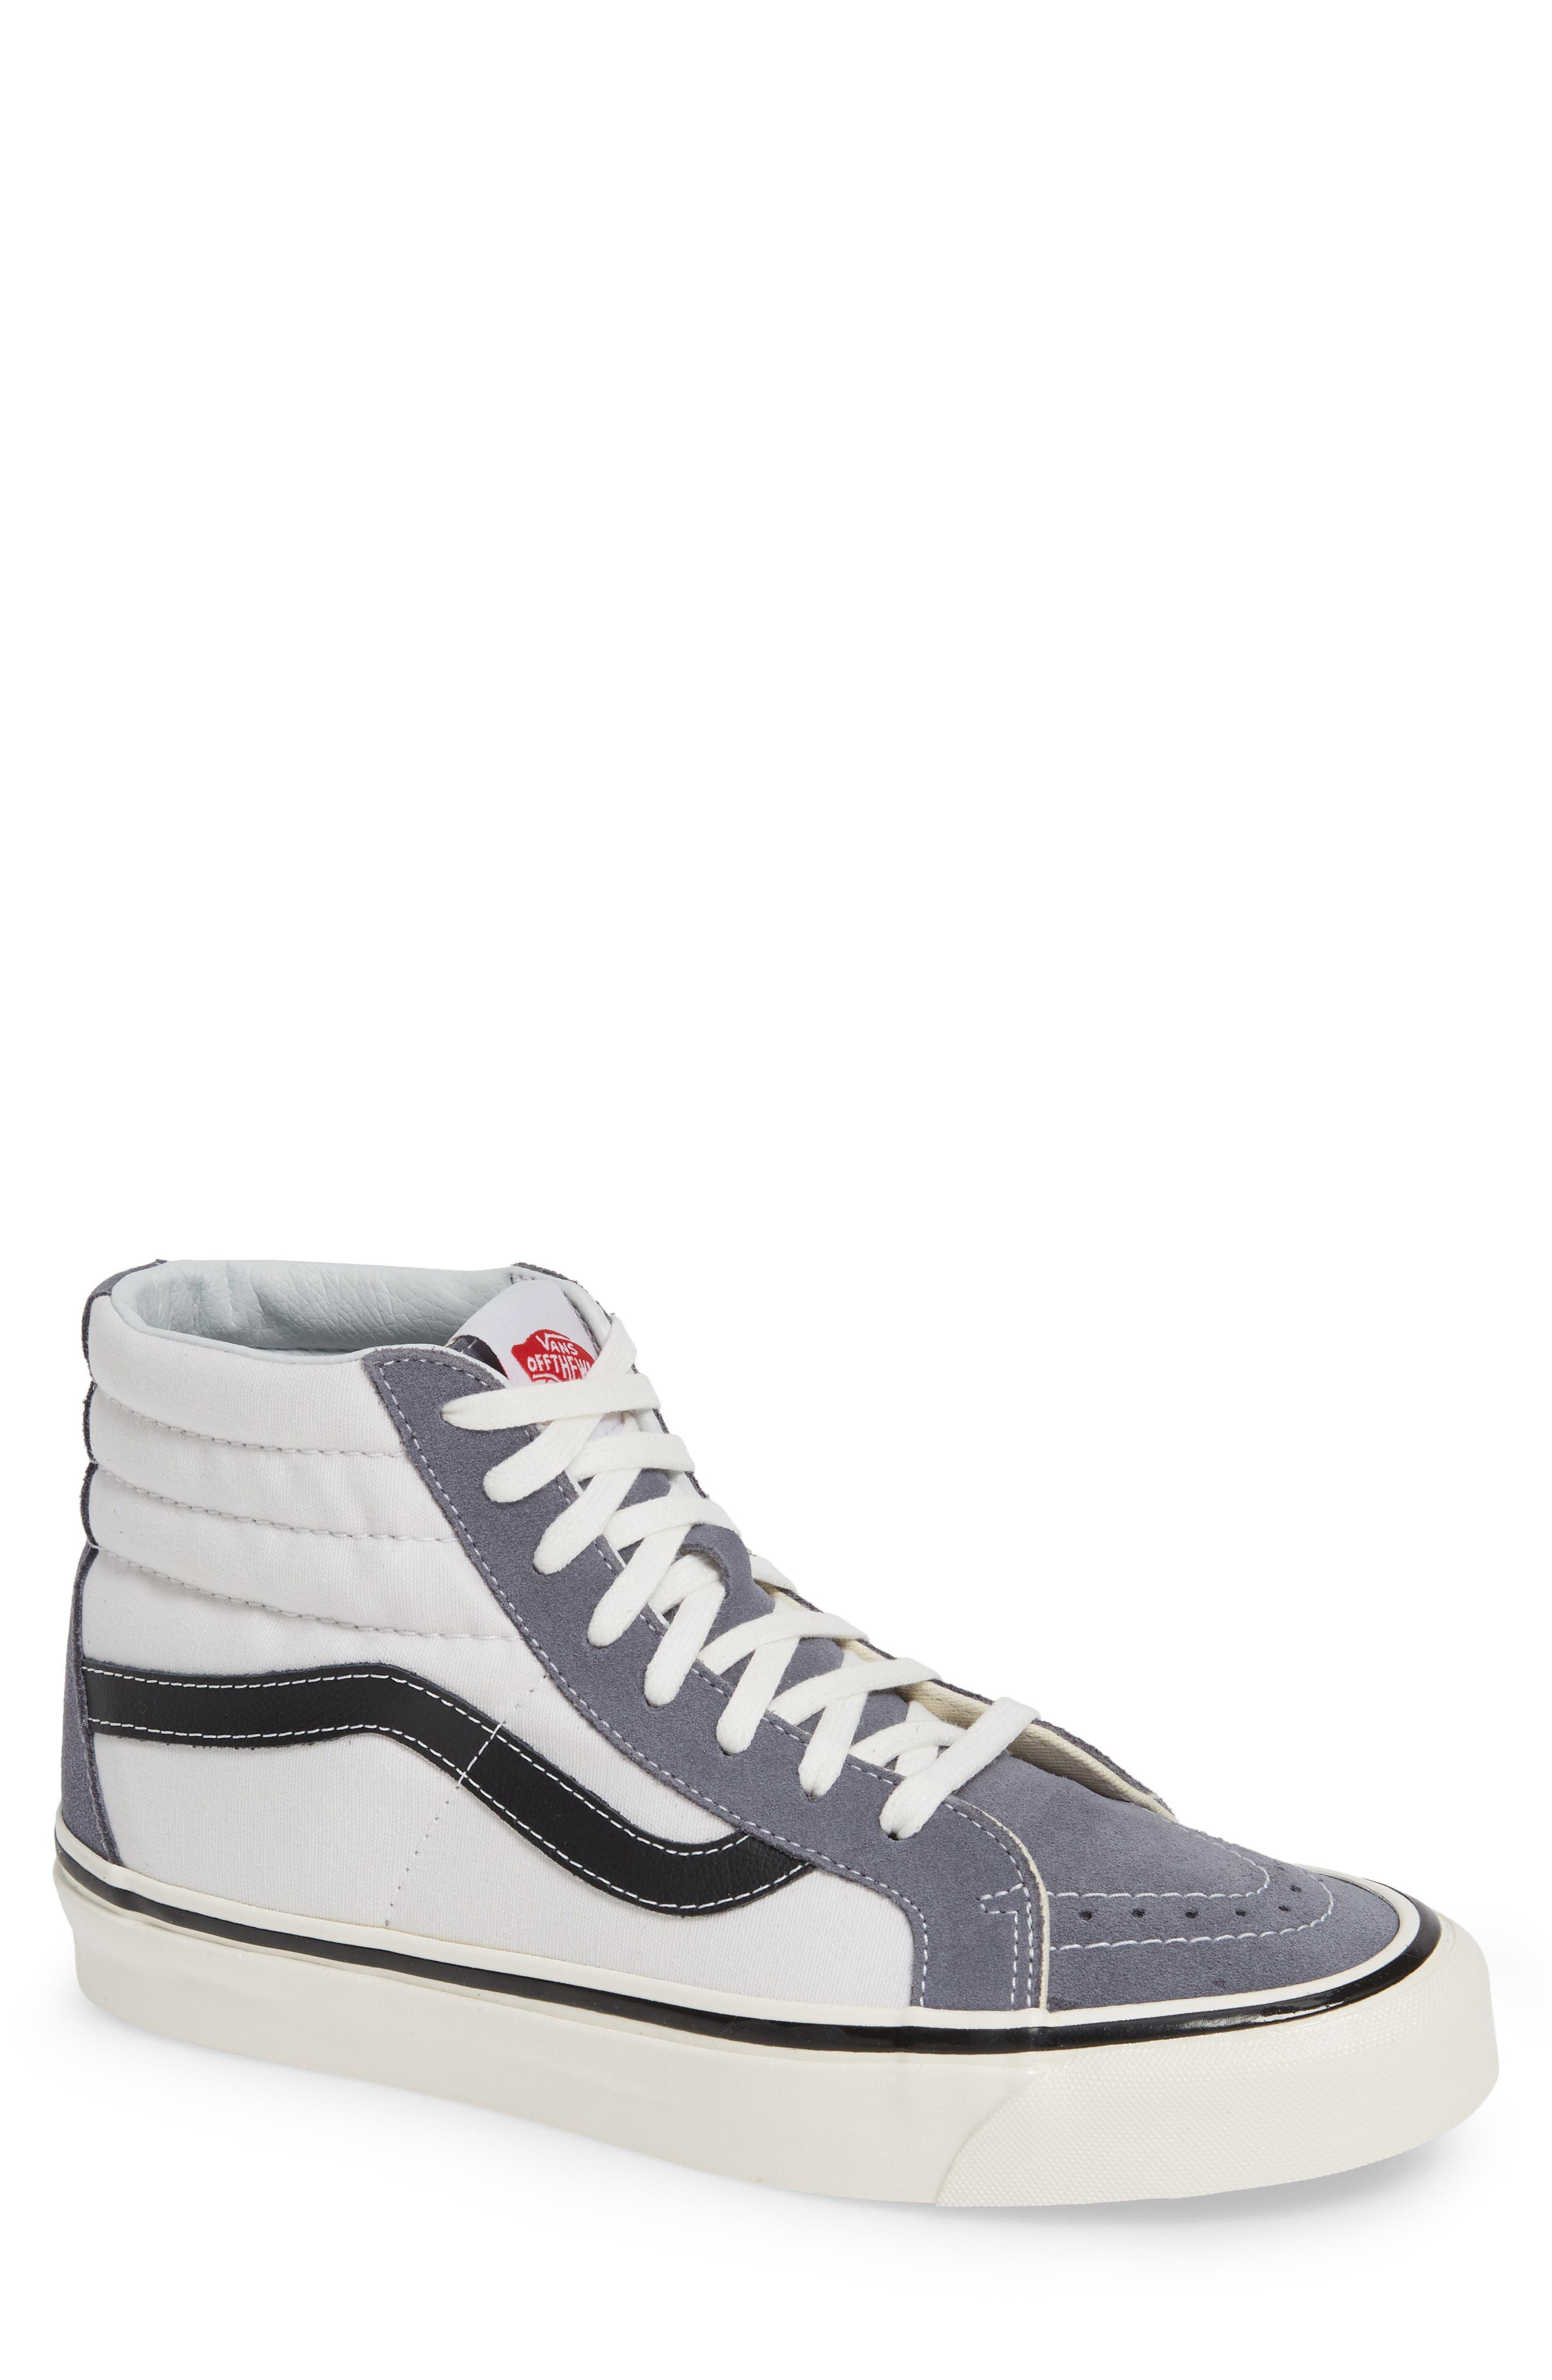 UA Sk8-Hi 38 DX Sneaker,                         Main,                         color, DARK GREY/ WHITE